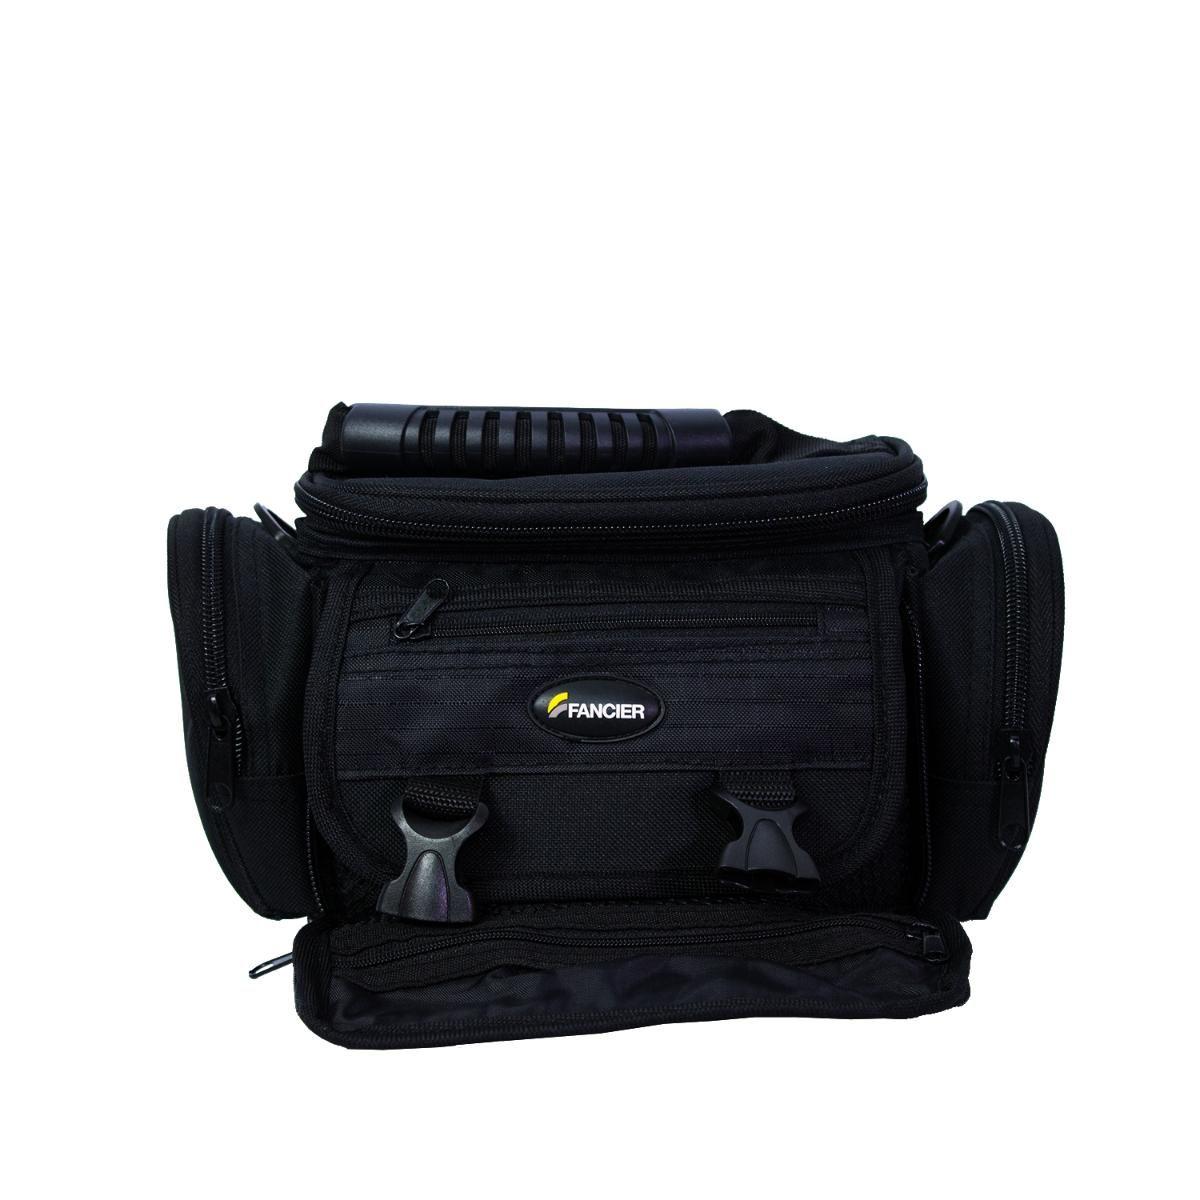 Bolsa Fancier WB-3226 para Câmera Semiprofissionais e DSLR  - Fotolux